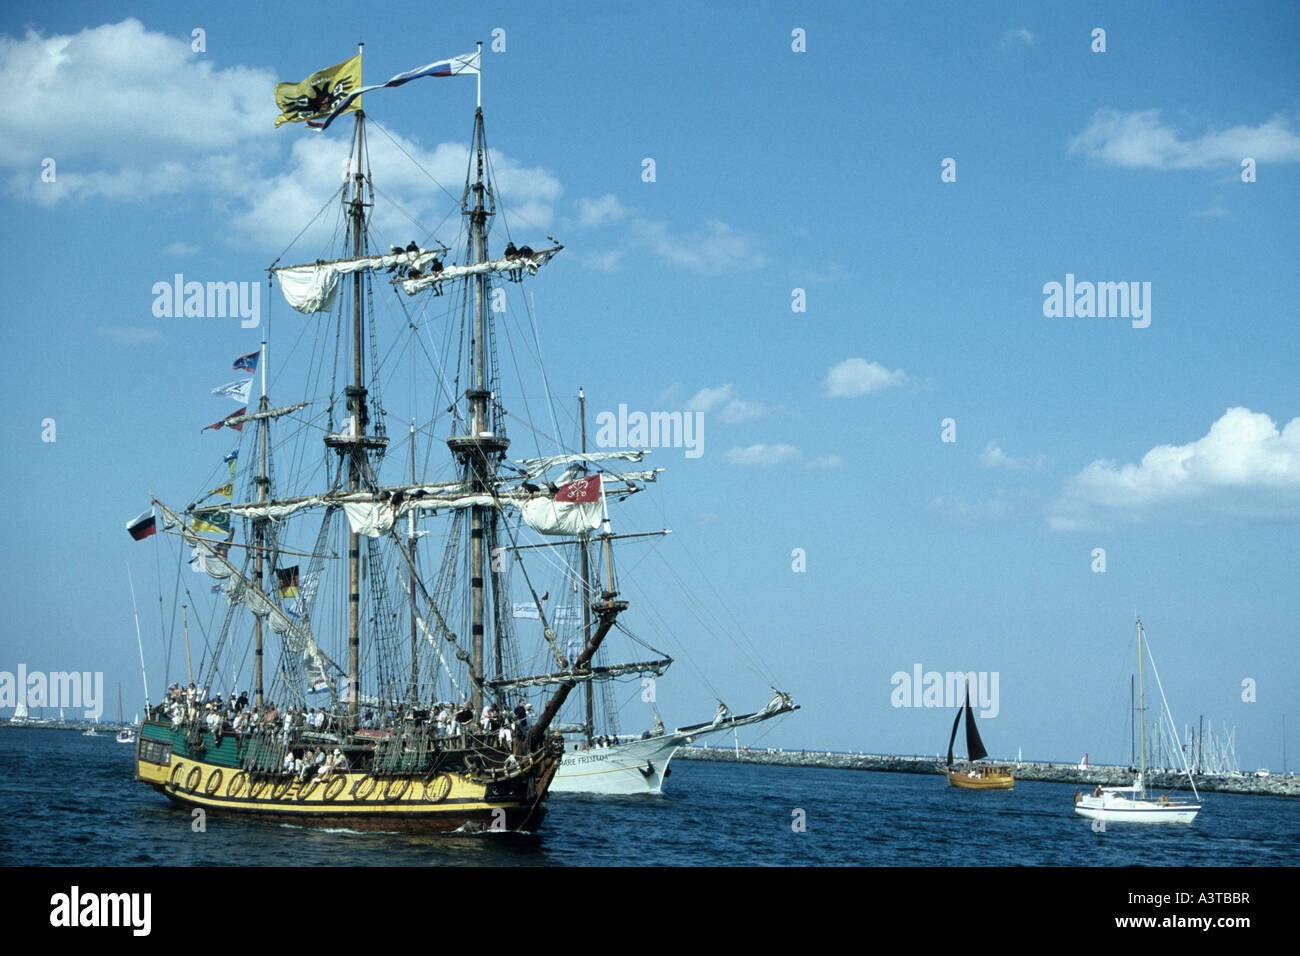 old sailingship, Germany, Mecklenburg-Western Pomerania, Warnemuende - Stock Image